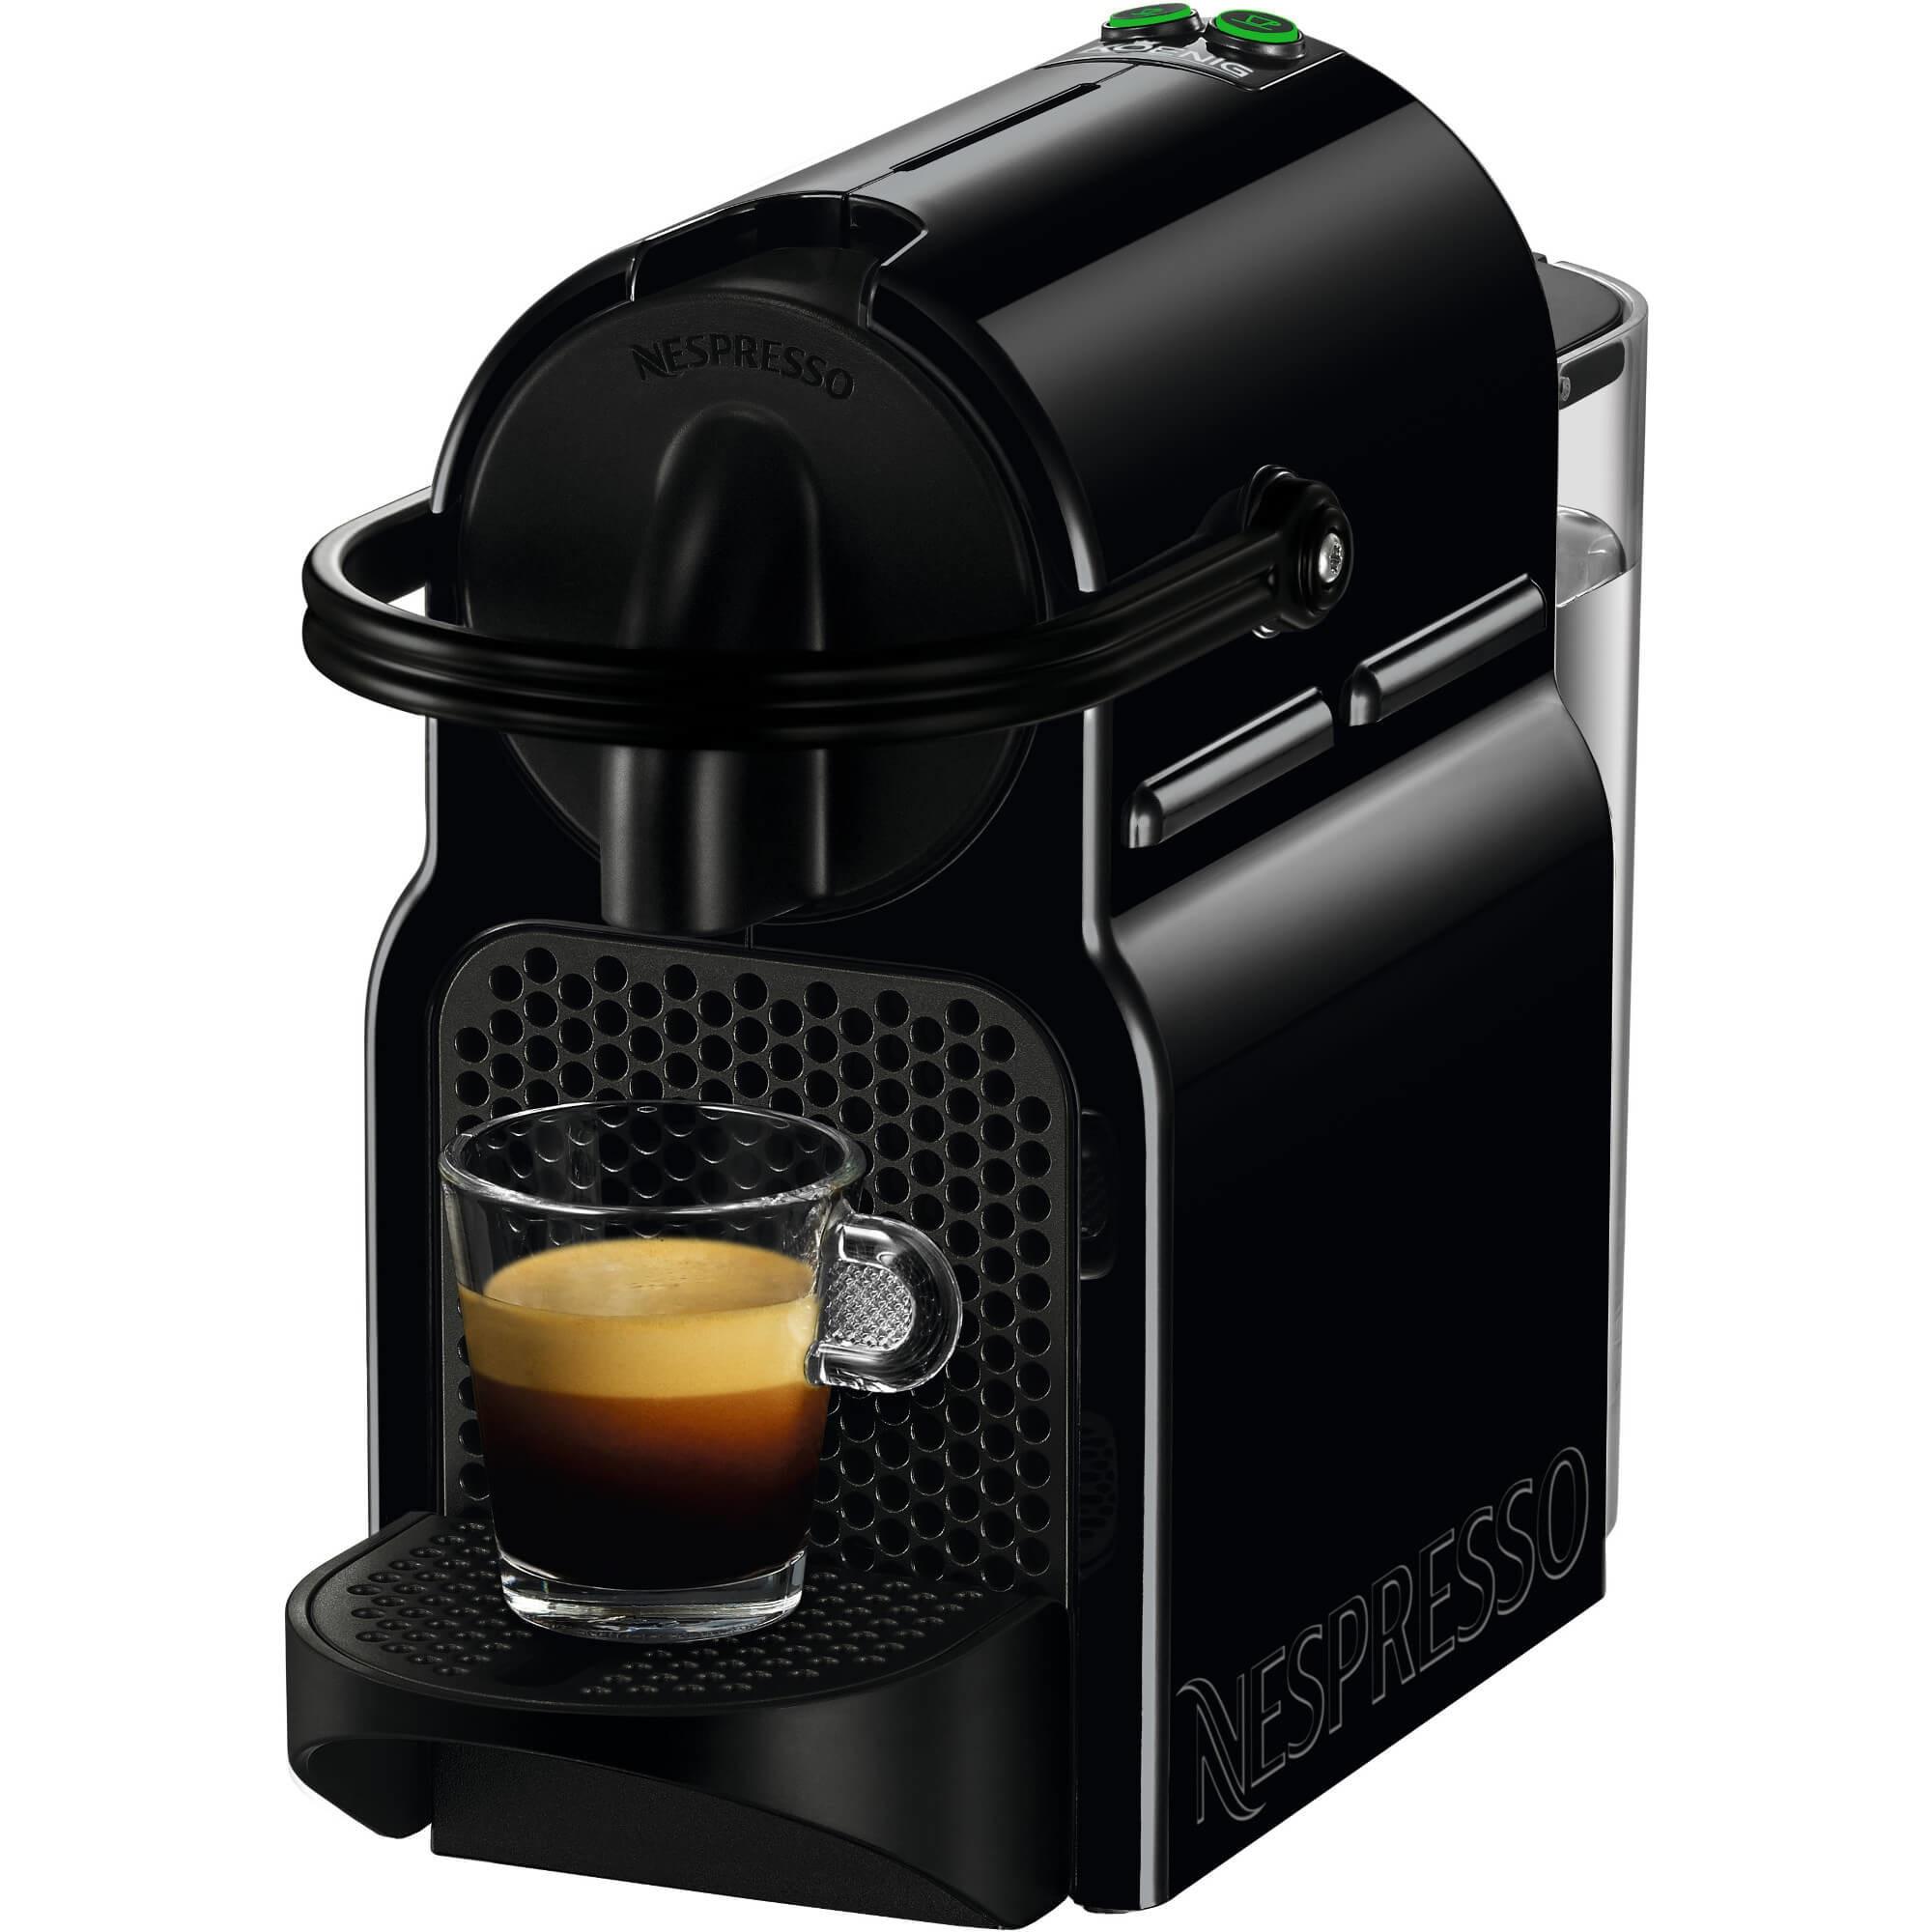 Nespresso delonghi kapszula Kapszula kereső